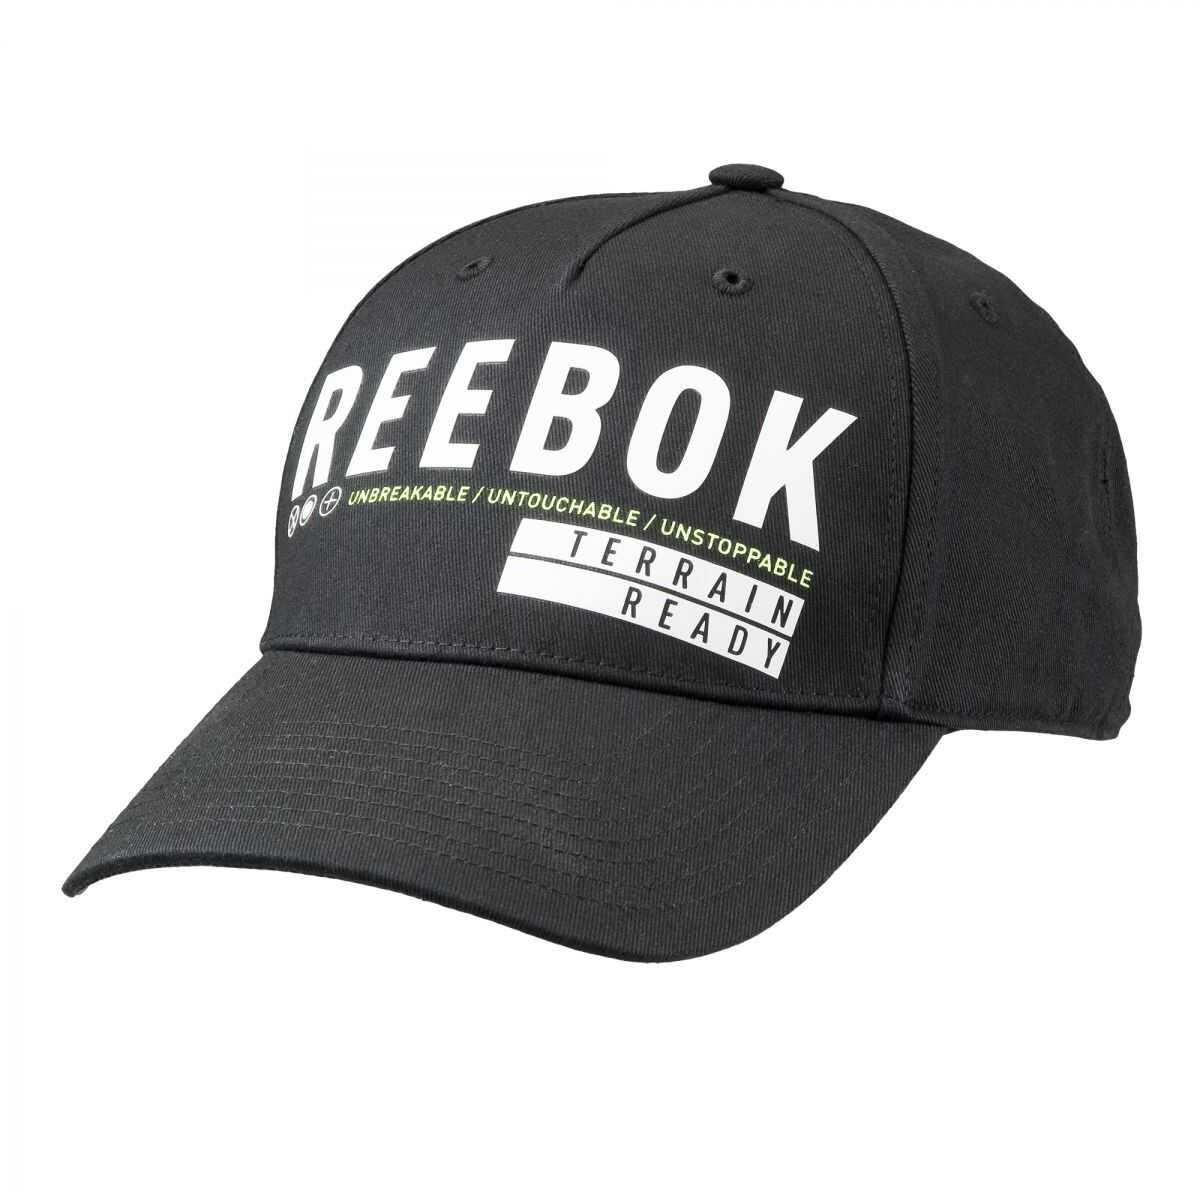 Reebok OTR CAP BLACK